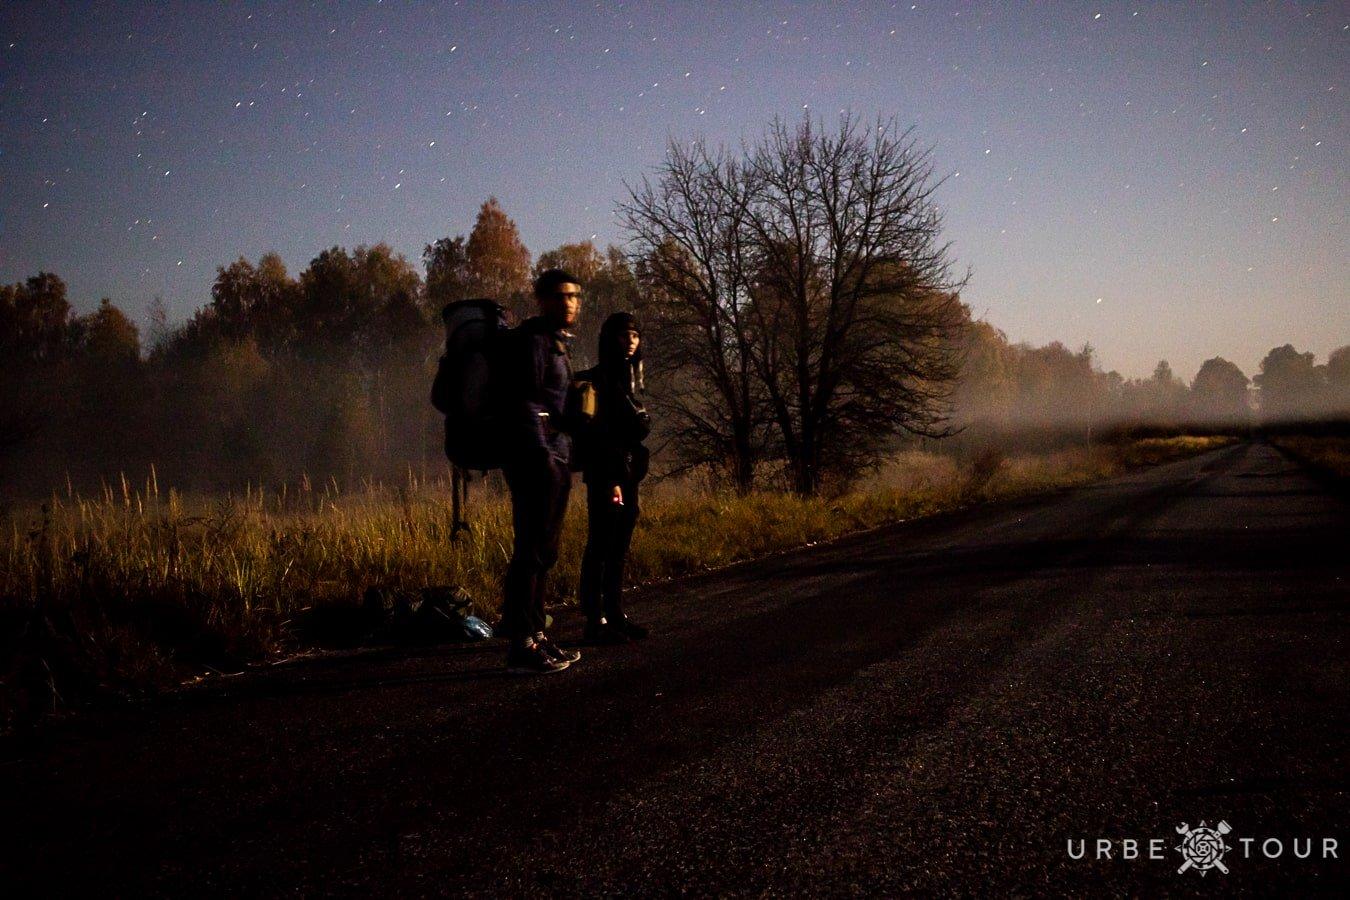 nights roads in chernobyl zone